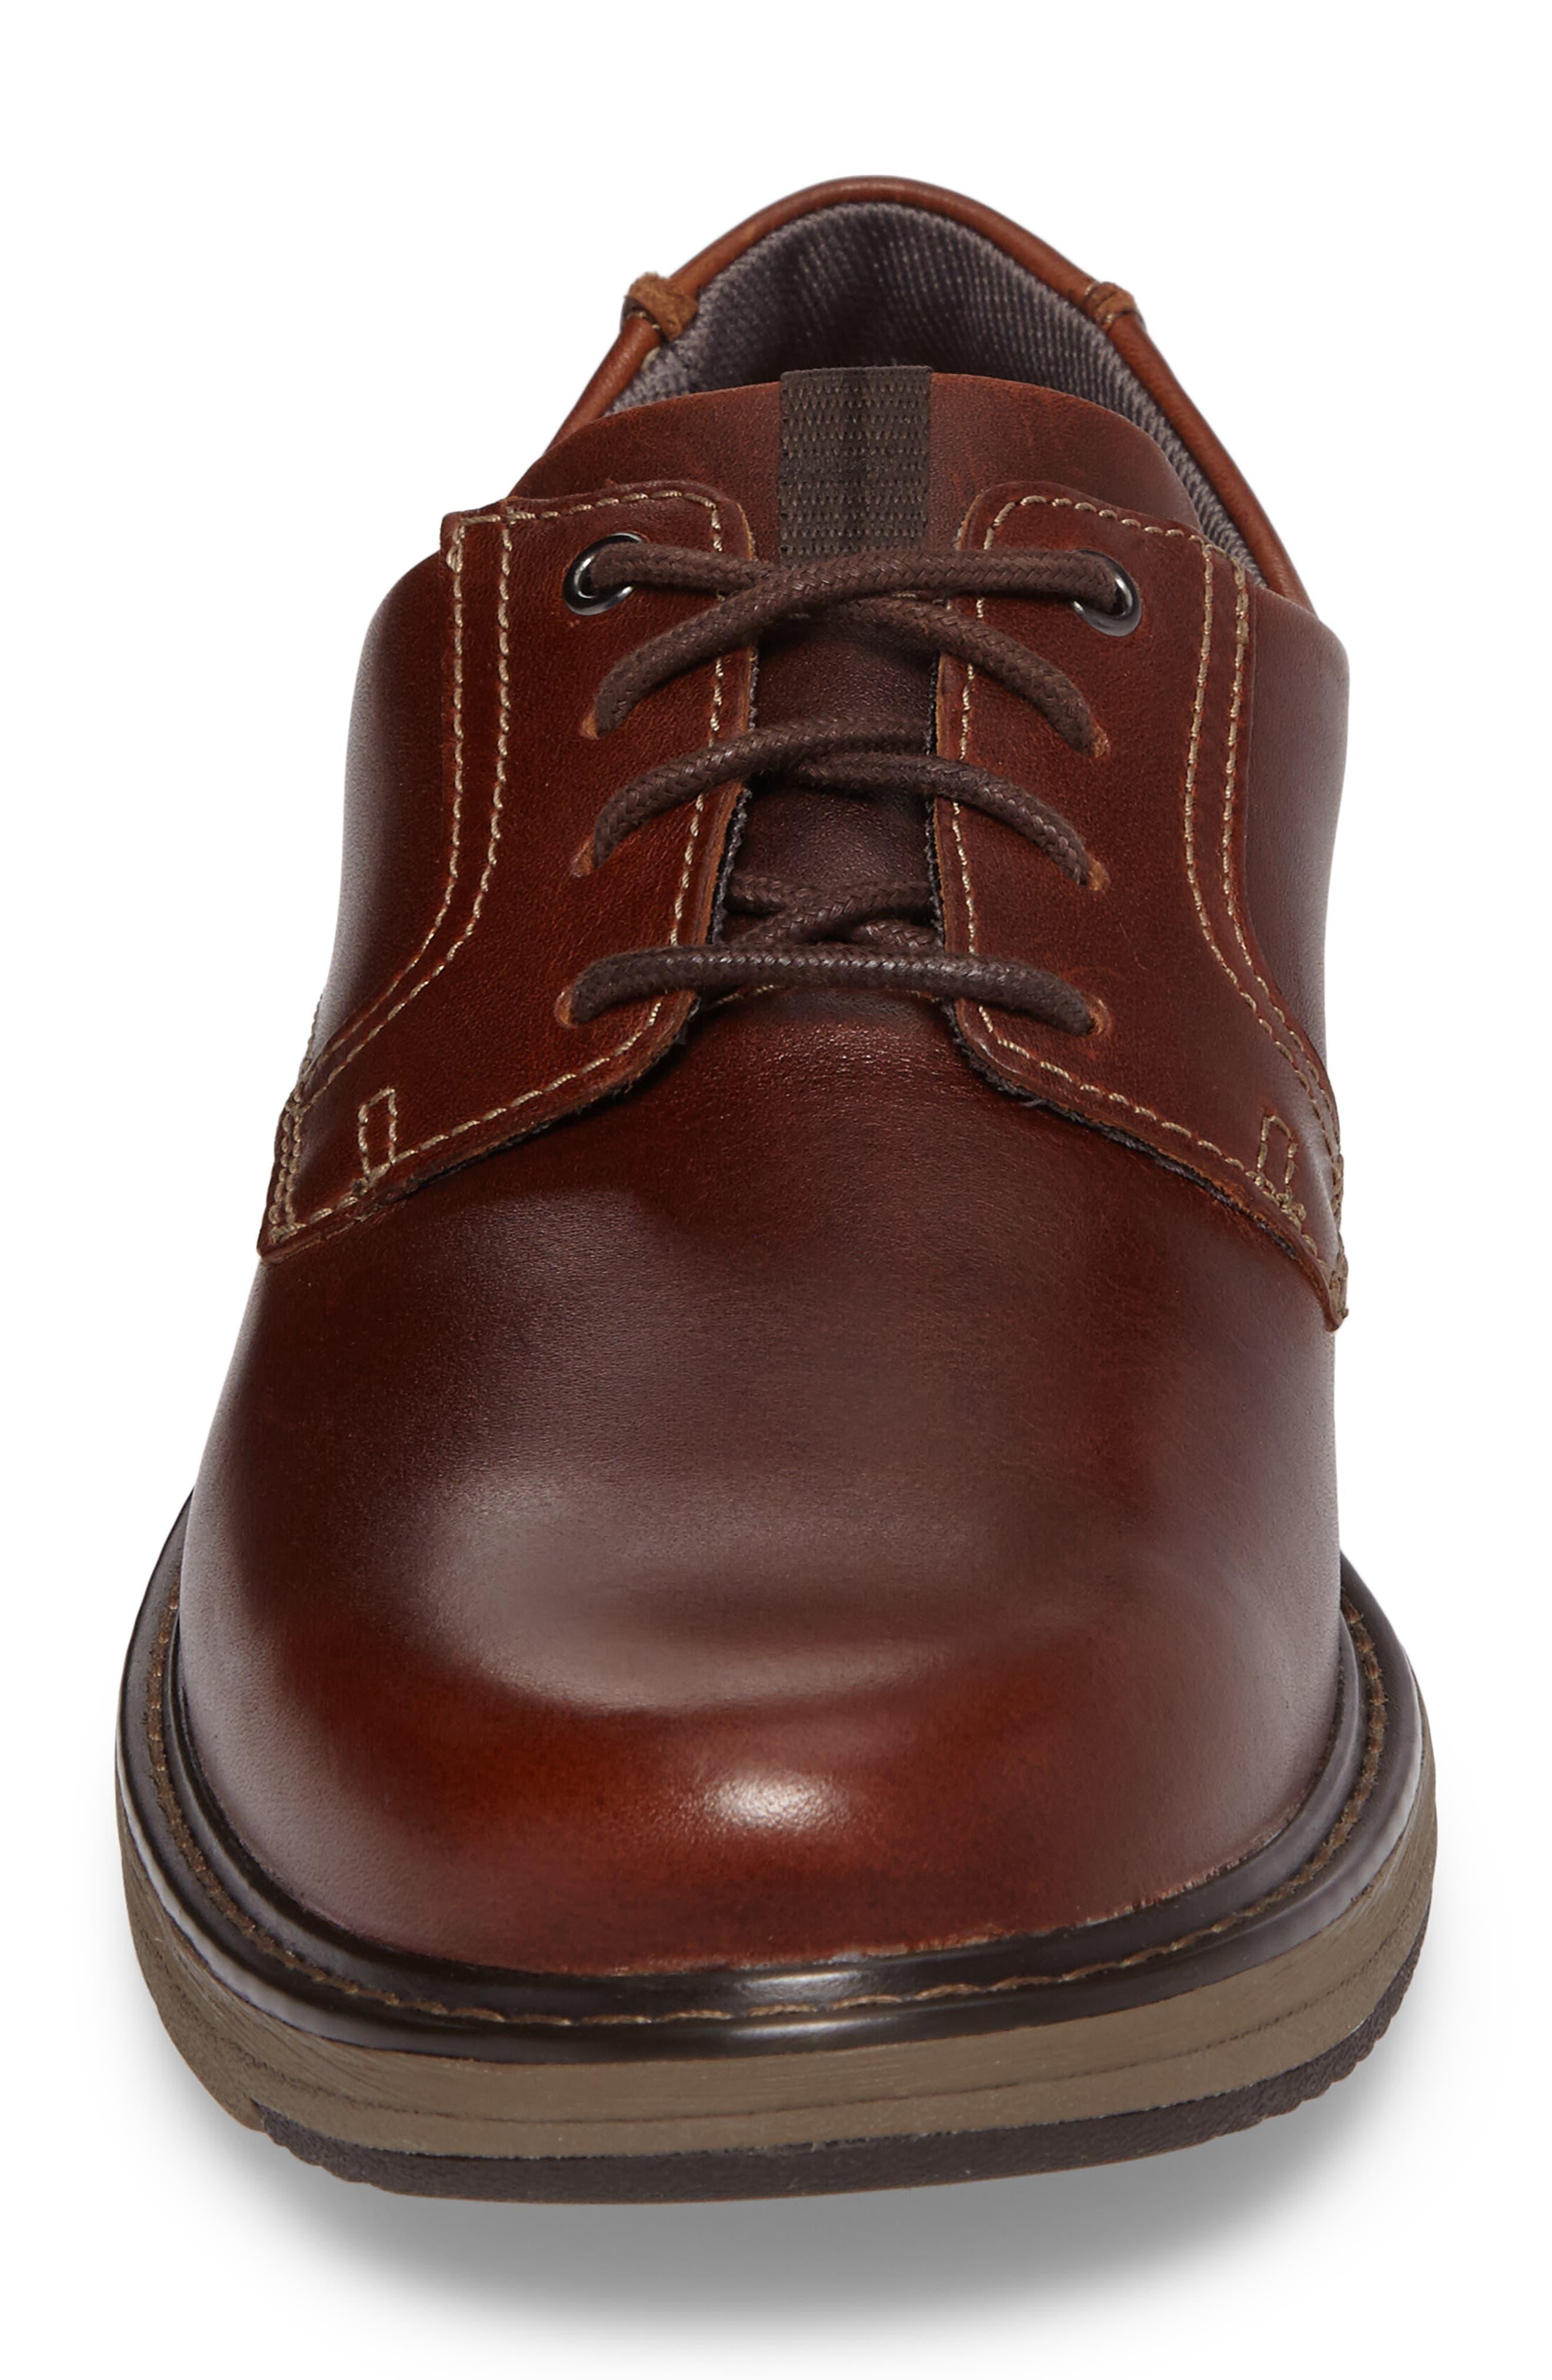 Cushox Plain Toe Derby,                             Alternate thumbnail 4, color,                             Dark Tan Leather